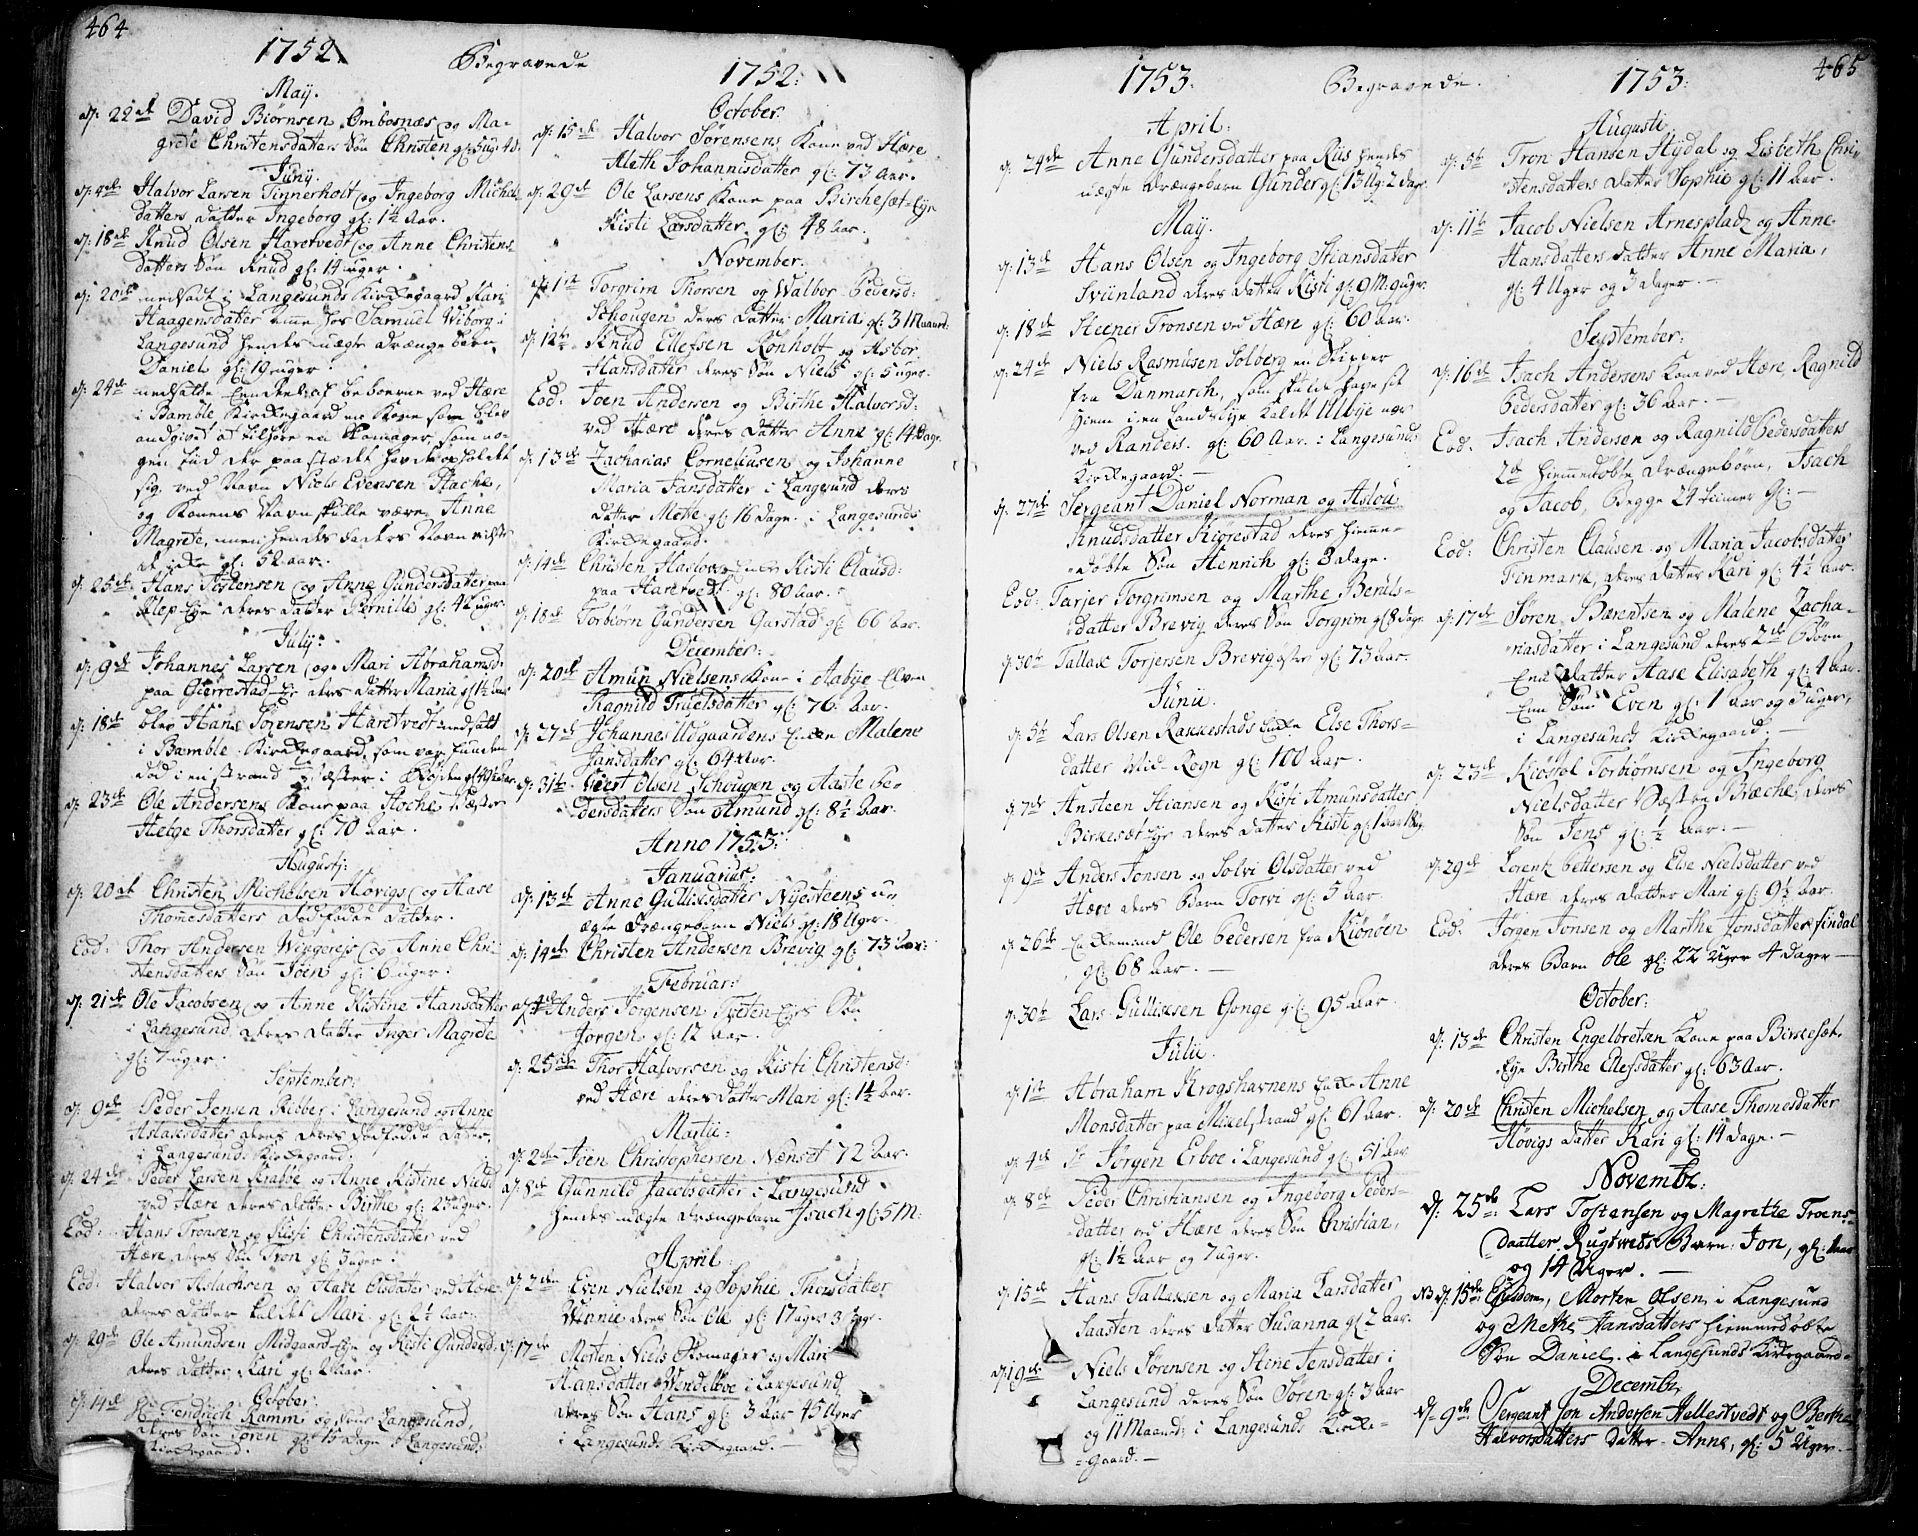 SAKO, Bamble kirkebøker, F/Fa/L0001: Ministerialbok nr. I 1, 1702-1774, s. 464-465